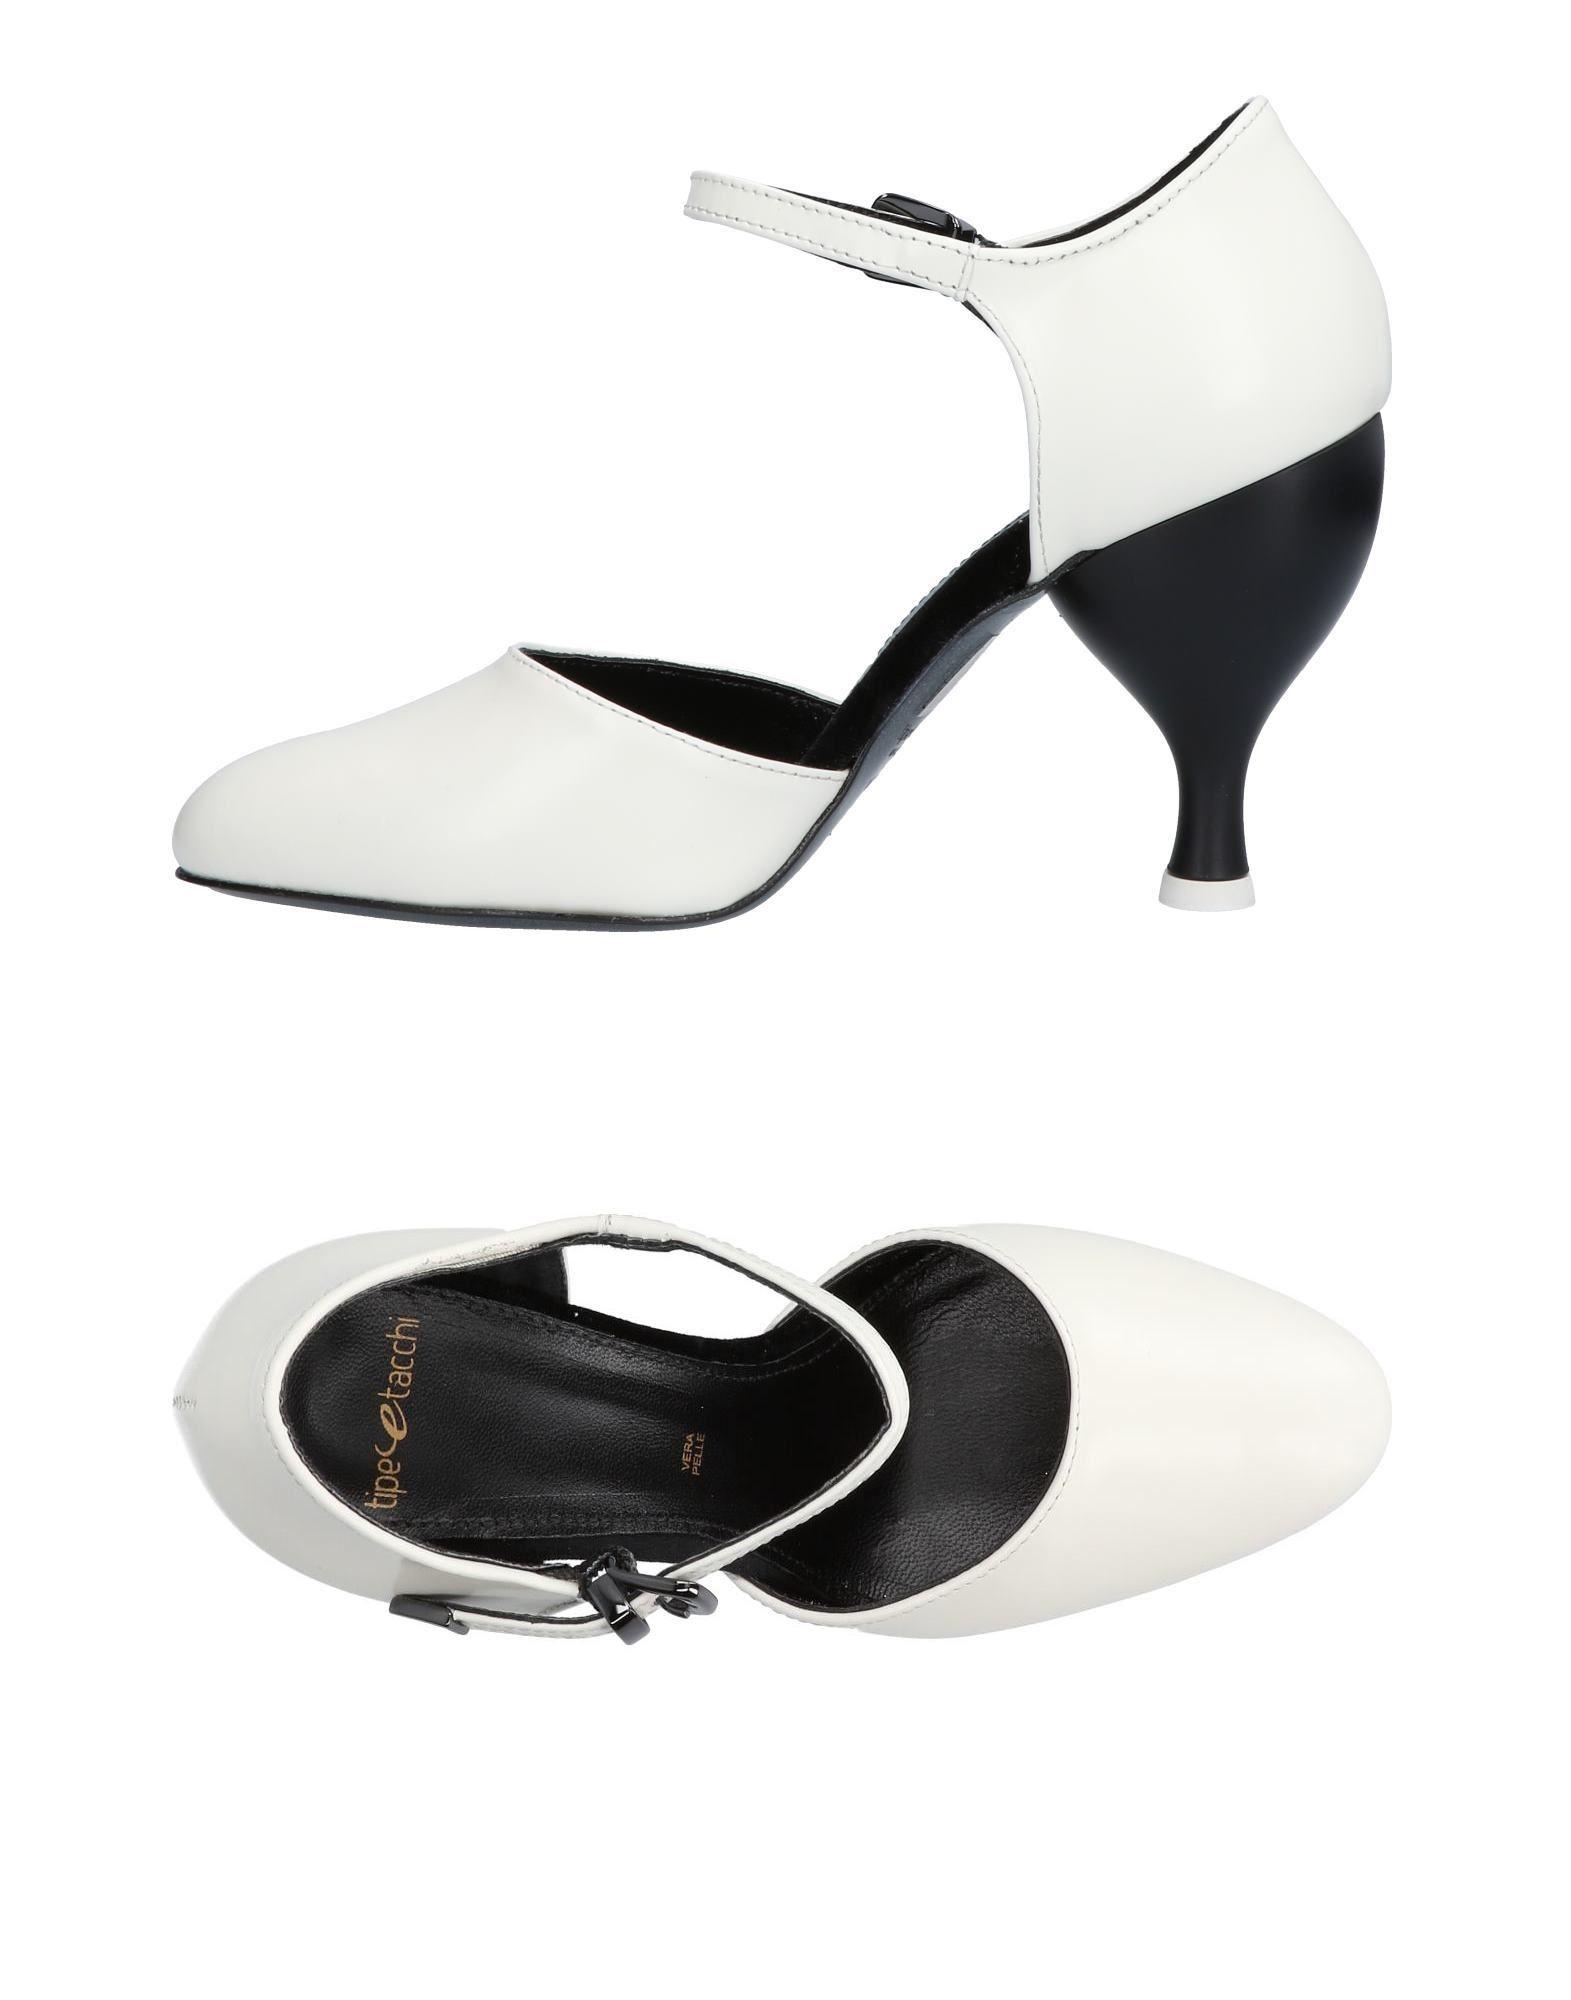 Tipe E Gute Tacchi Pumps Damen  11448226VG Gute E Qualität beliebte Schuhe a86a48